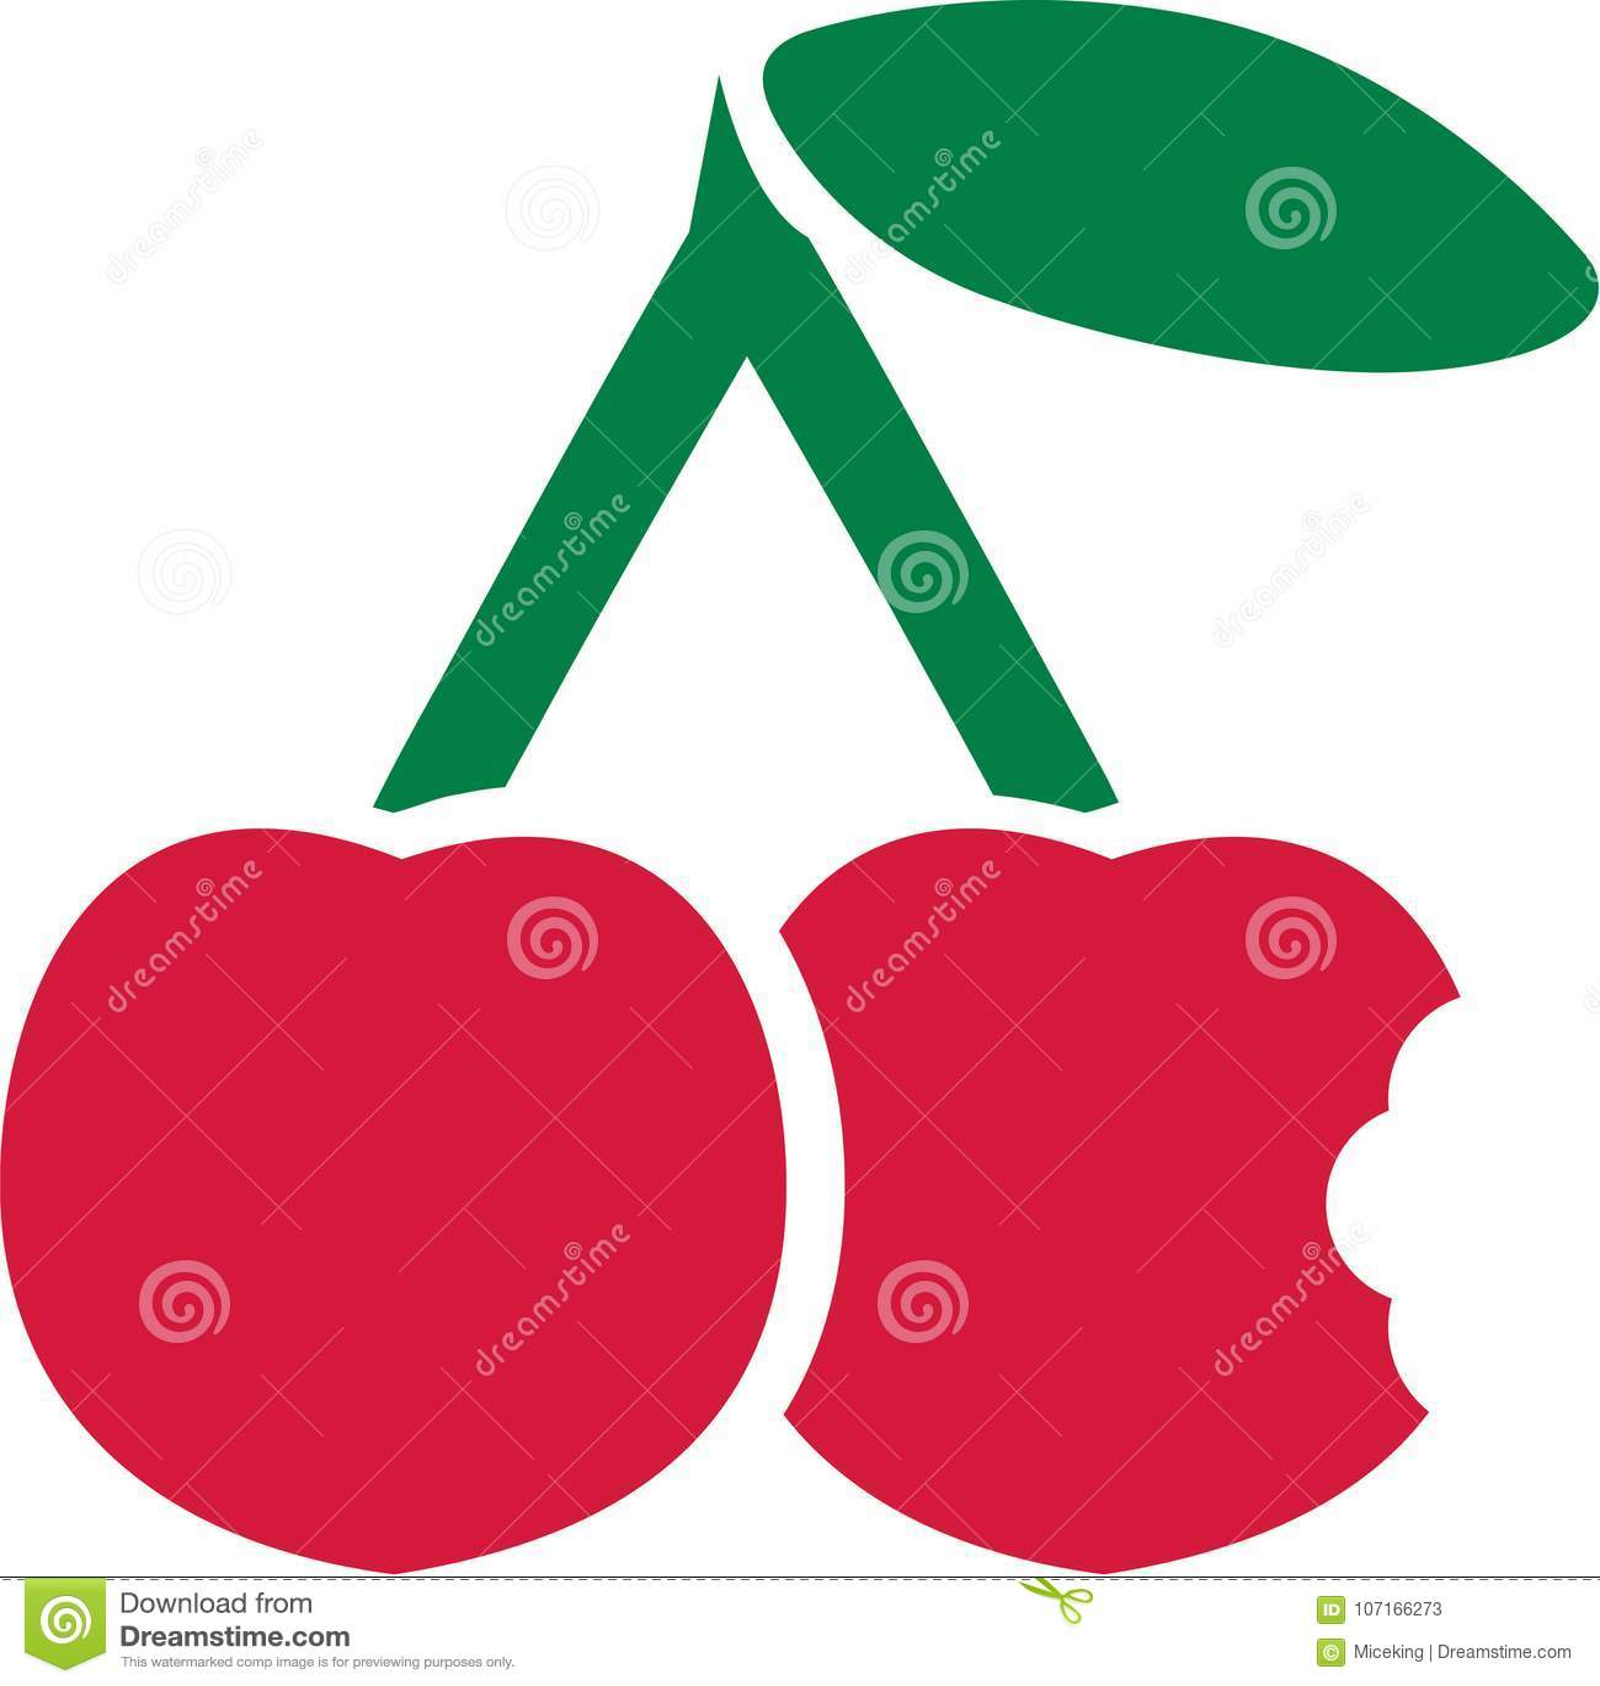 Bitten into cherry